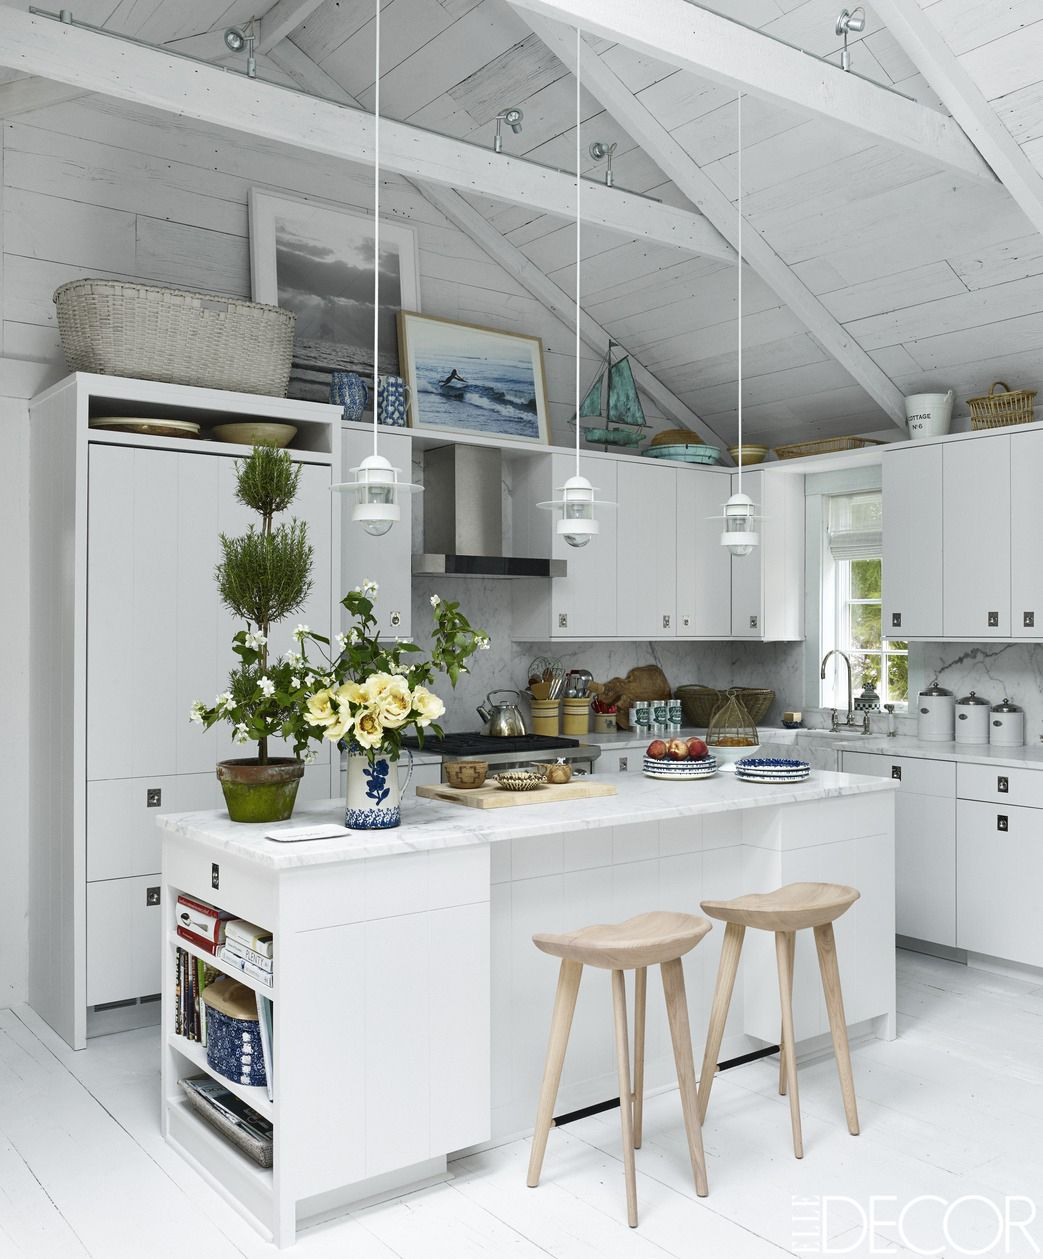 Quién Dice Que Una Cocina De Diseño Tradicional No Puede Ser De Gorgeous The Best Kitchen Design Design Decoration